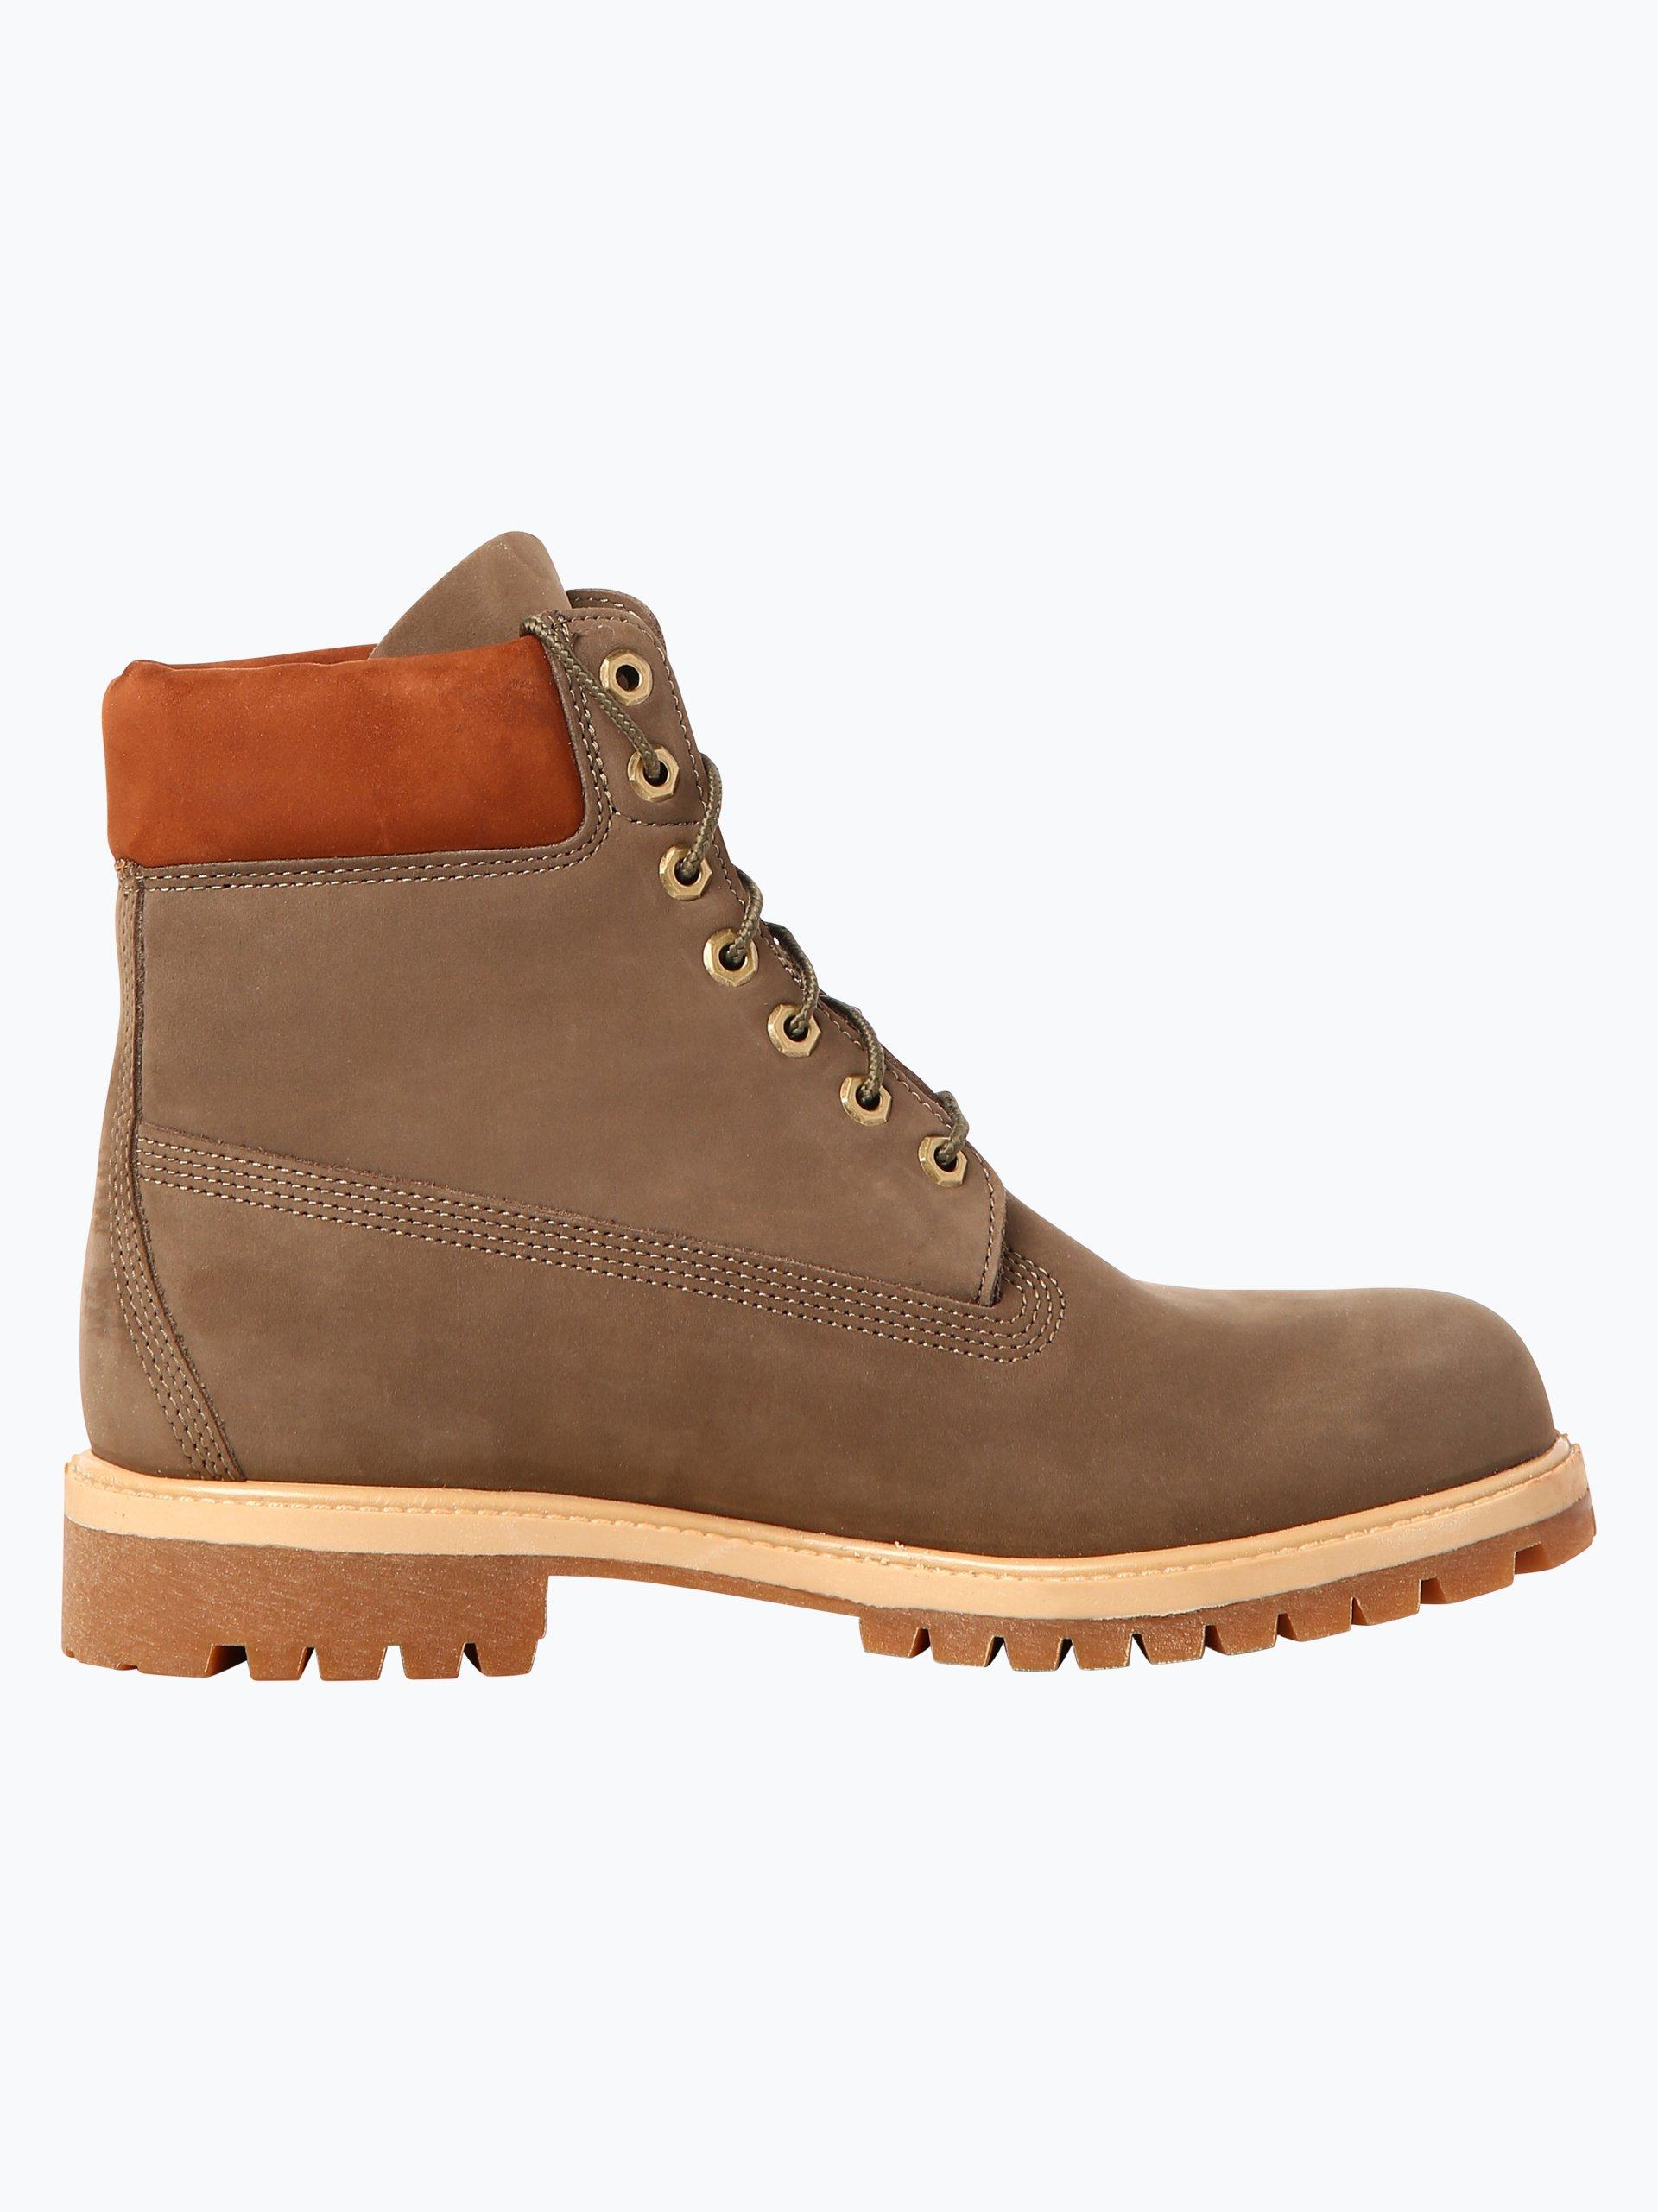 timberland herren boots aus leder taupe cognac uni online kaufen peek und cloppenburg de. Black Bedroom Furniture Sets. Home Design Ideas